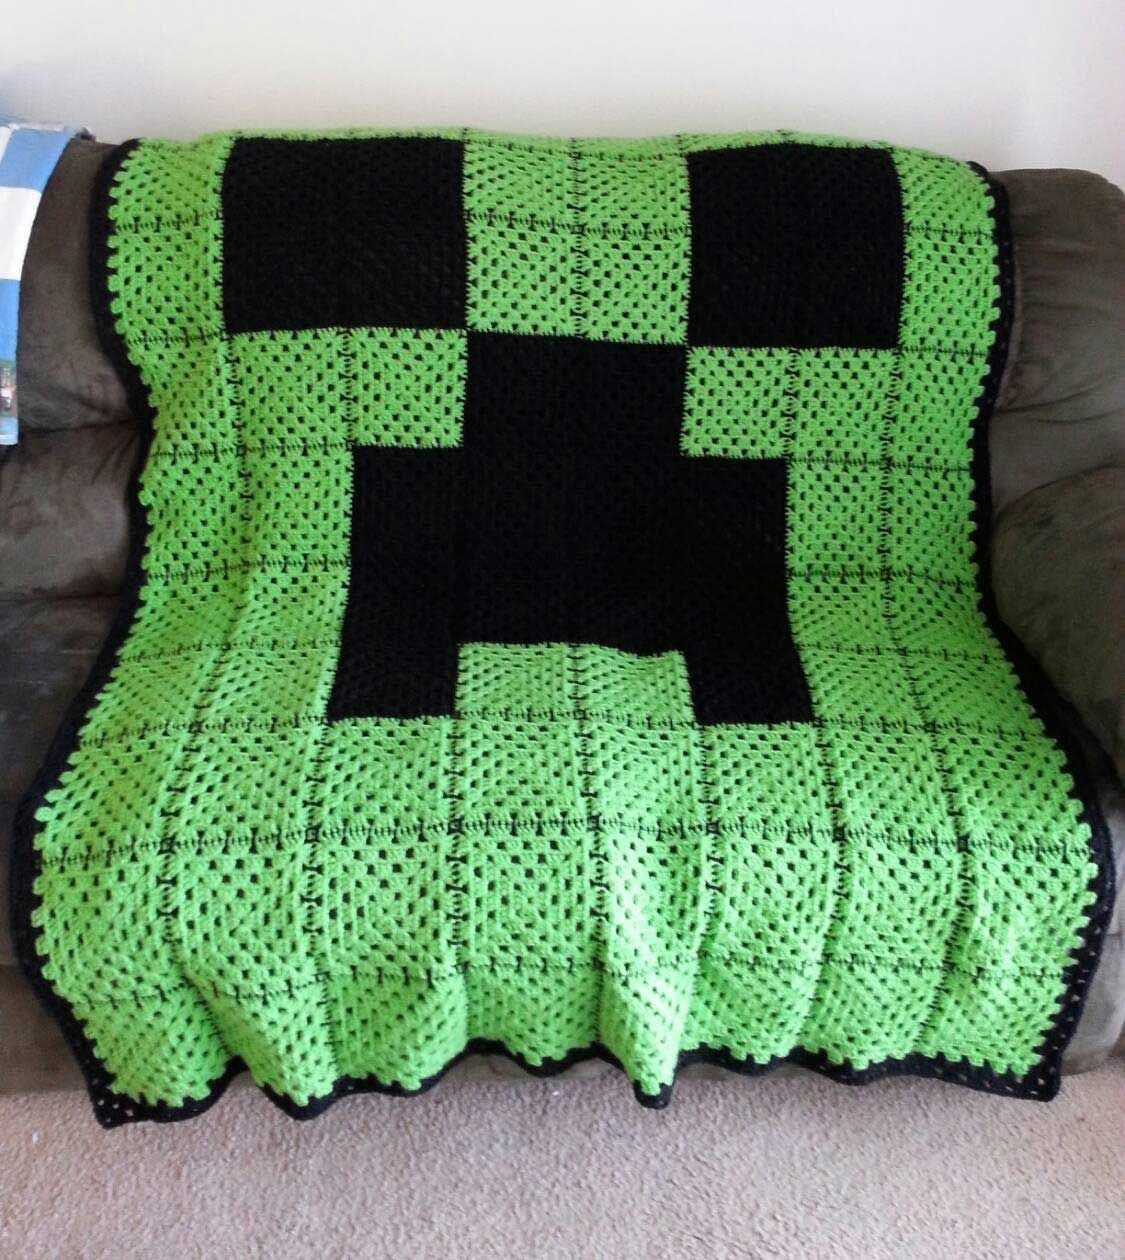 Minecraft creeper crochet blanket diy pinterest crochet minecraft creeper crochet blanket bankloansurffo Image collections